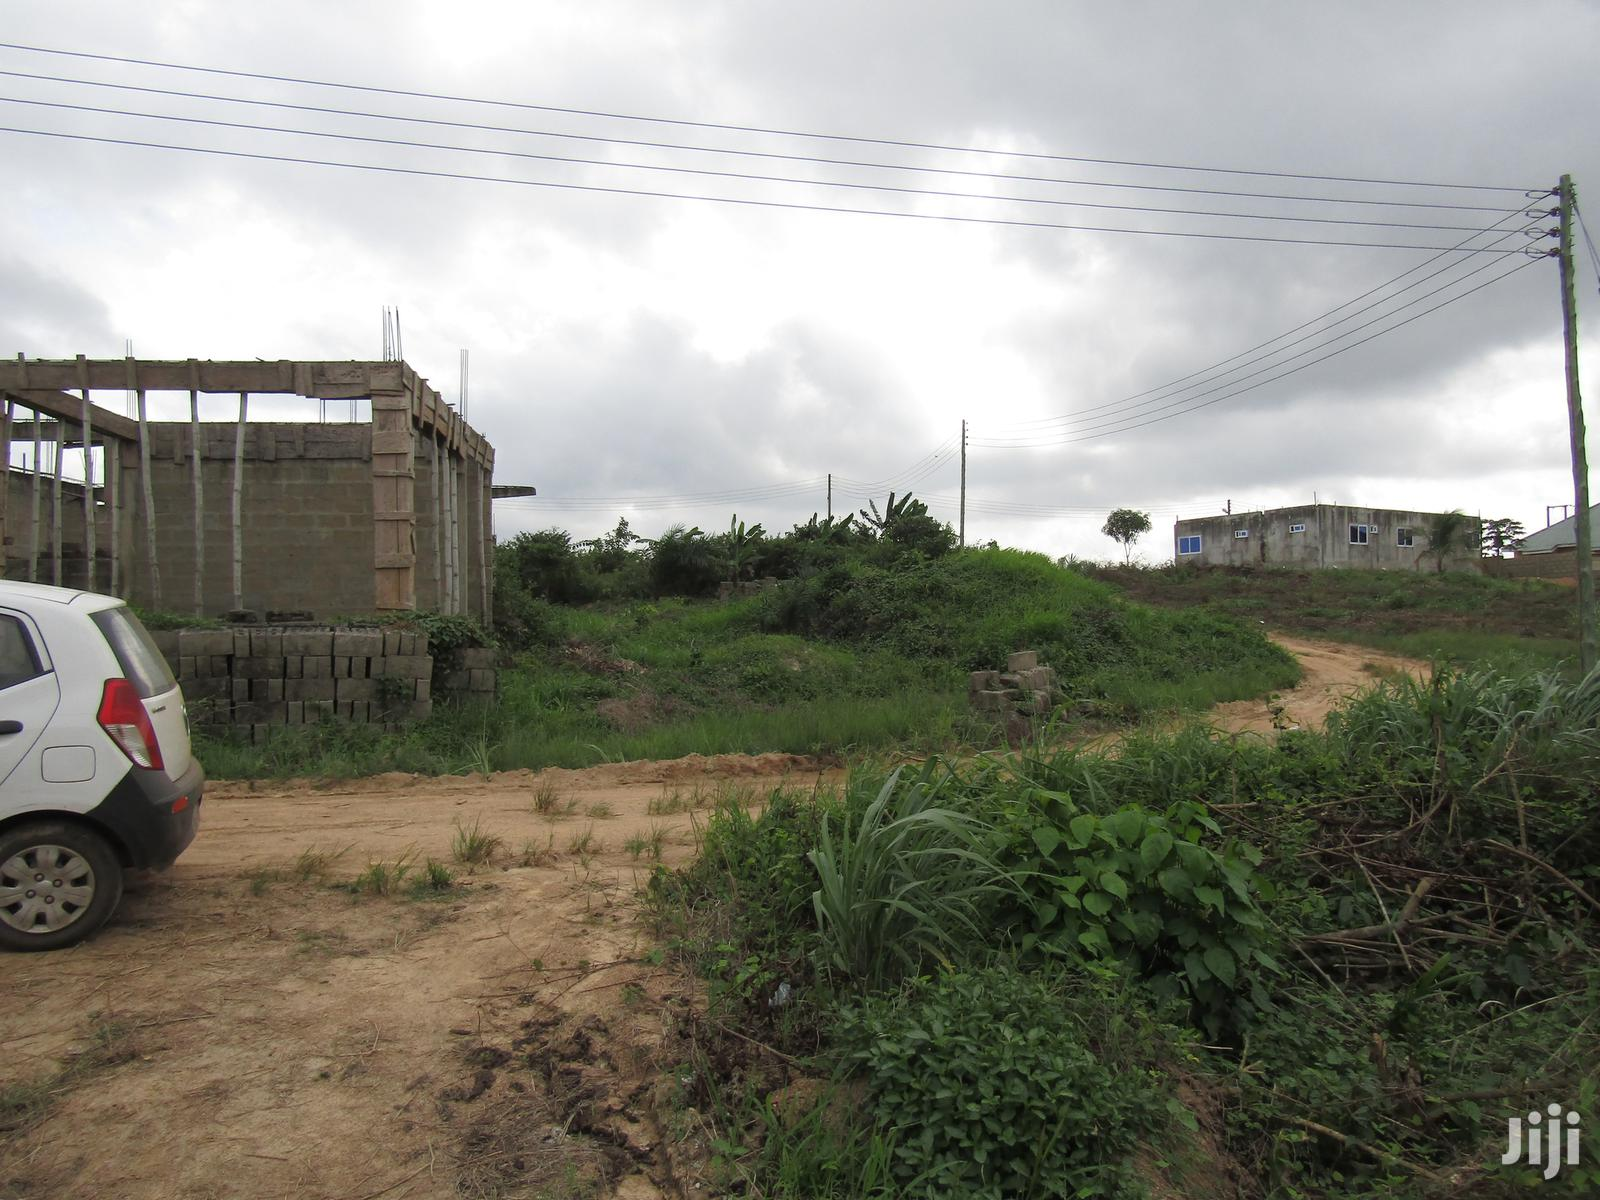 4 Bedrooms at Lintel Level- Takoradi Diamond Cement   Houses & Apartments For Sale for sale in Ahanta West, Western Region, Ghana